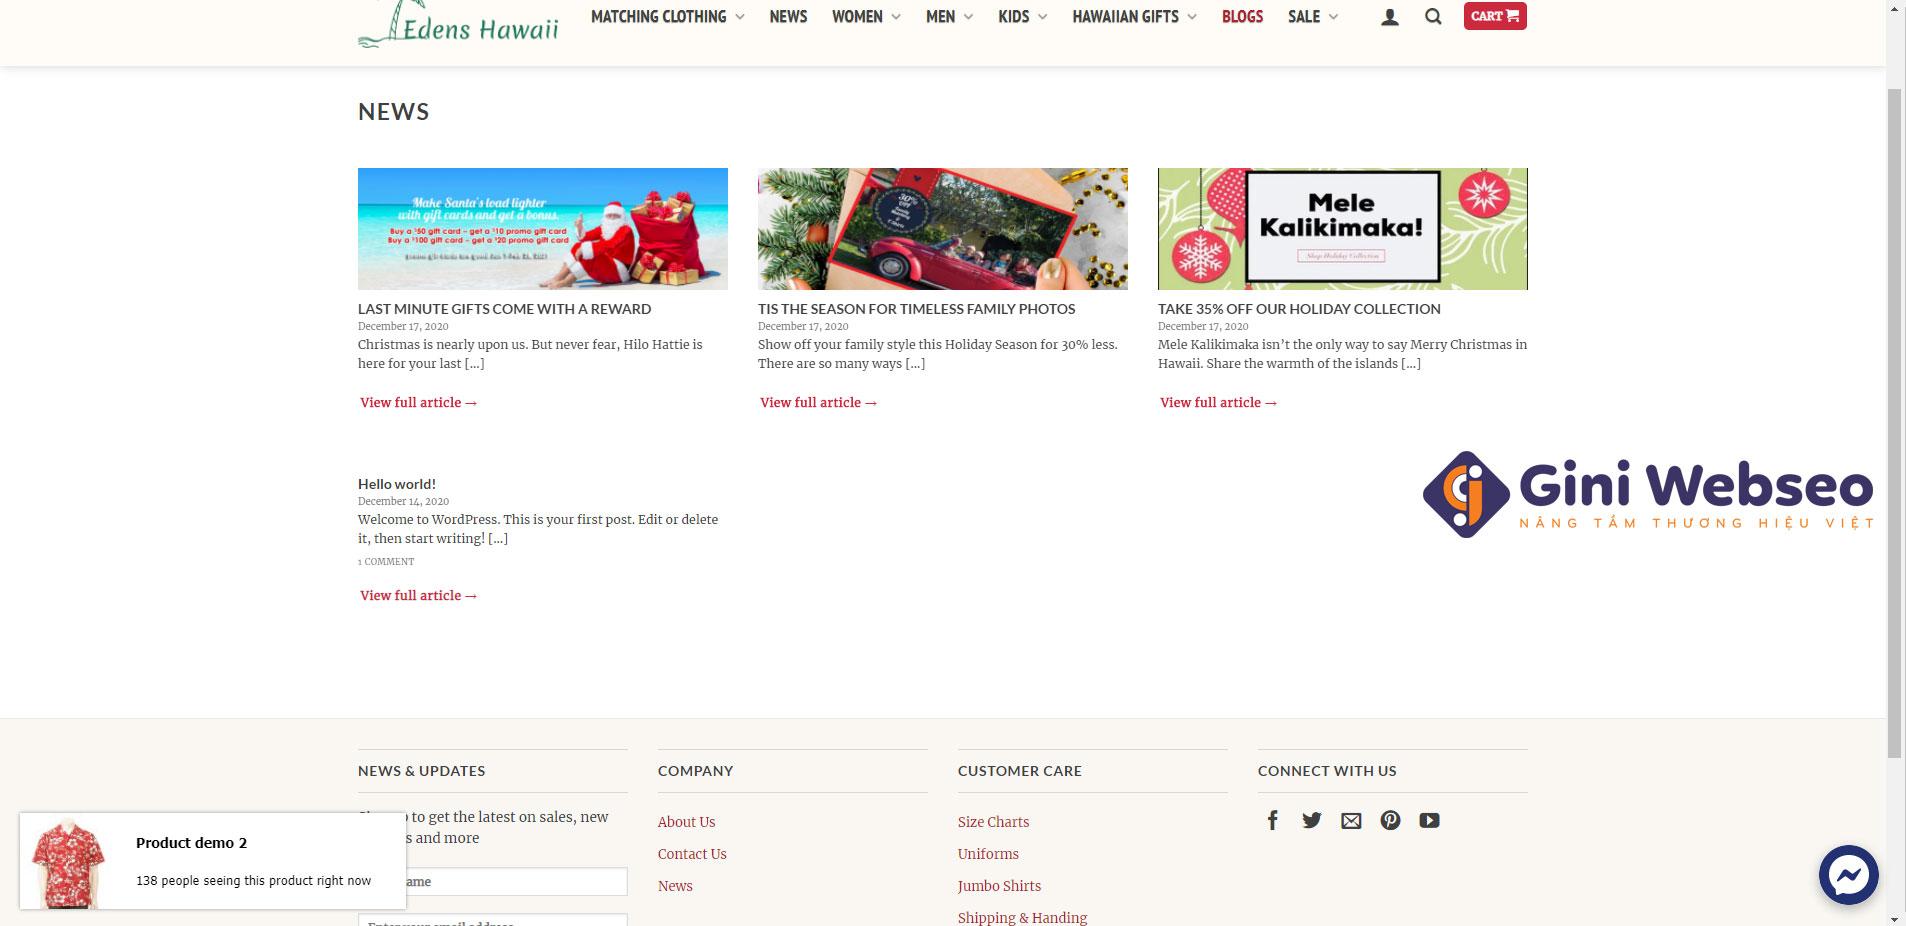 Thiết kế website thời trang Hilohattie